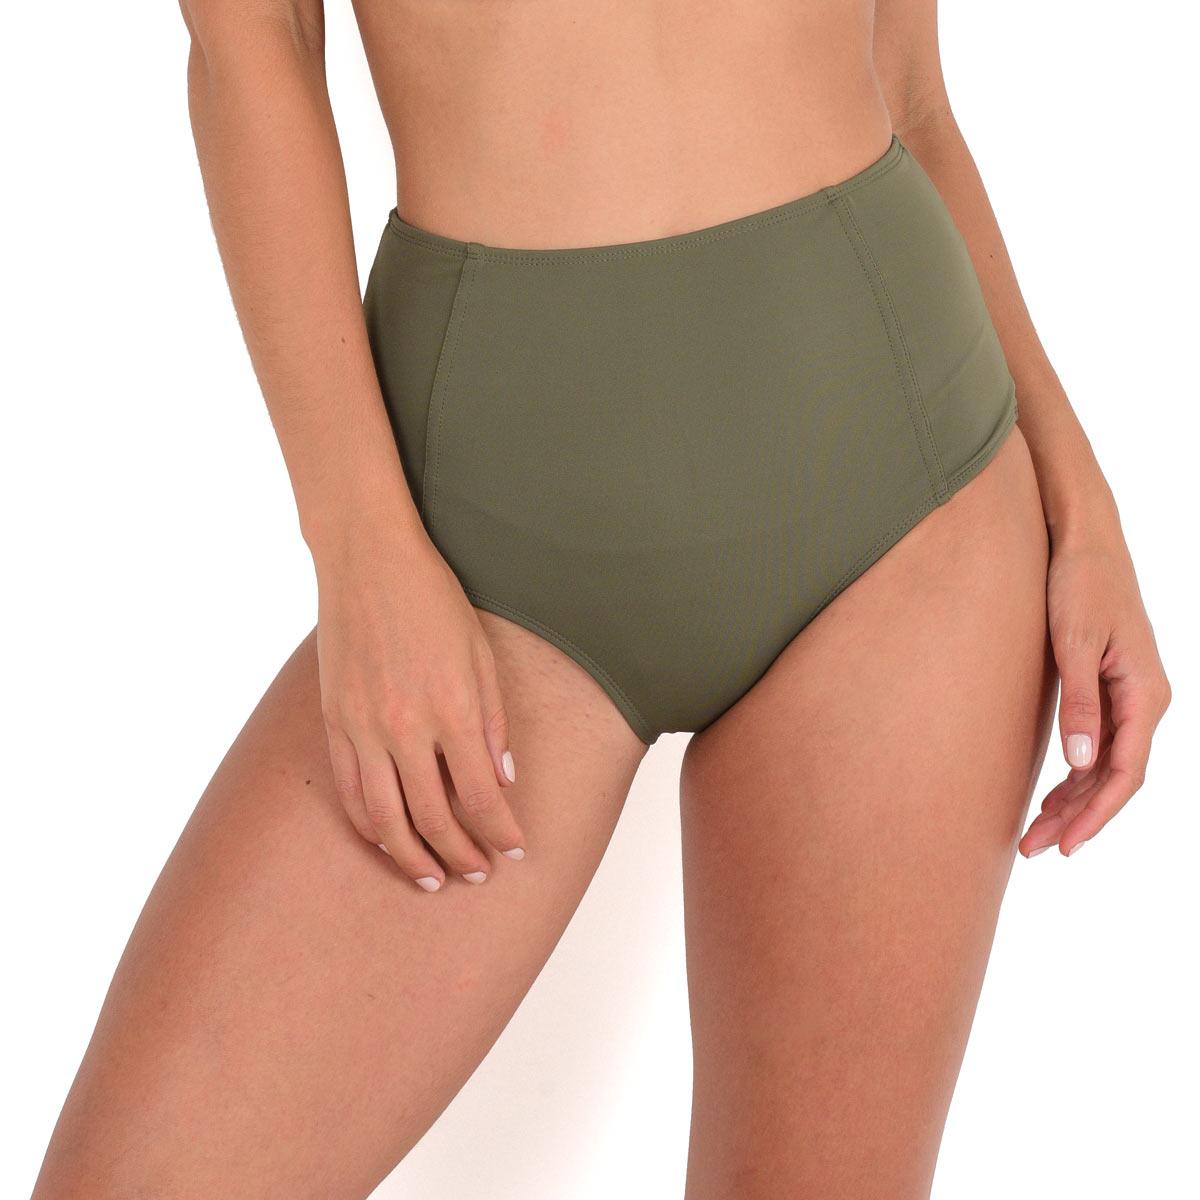 Ma Culotte Taille Haute vert kaki (Bas)